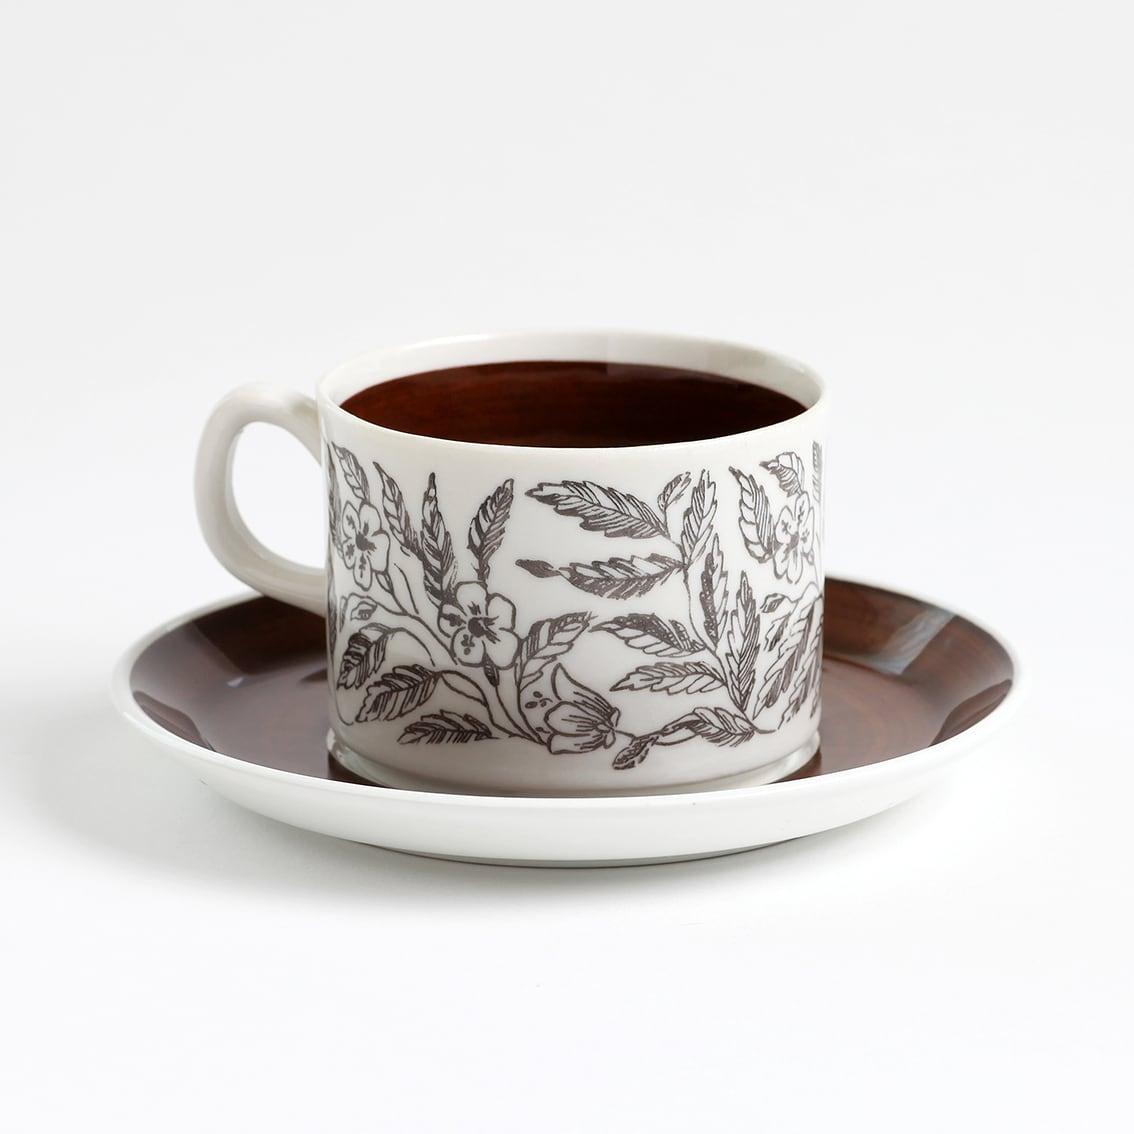 GEFLE ゲフレ Fontana フォンタナ コーヒーカップ&ソーサー - 3 北欧ヴィンテージ ★わけあり★